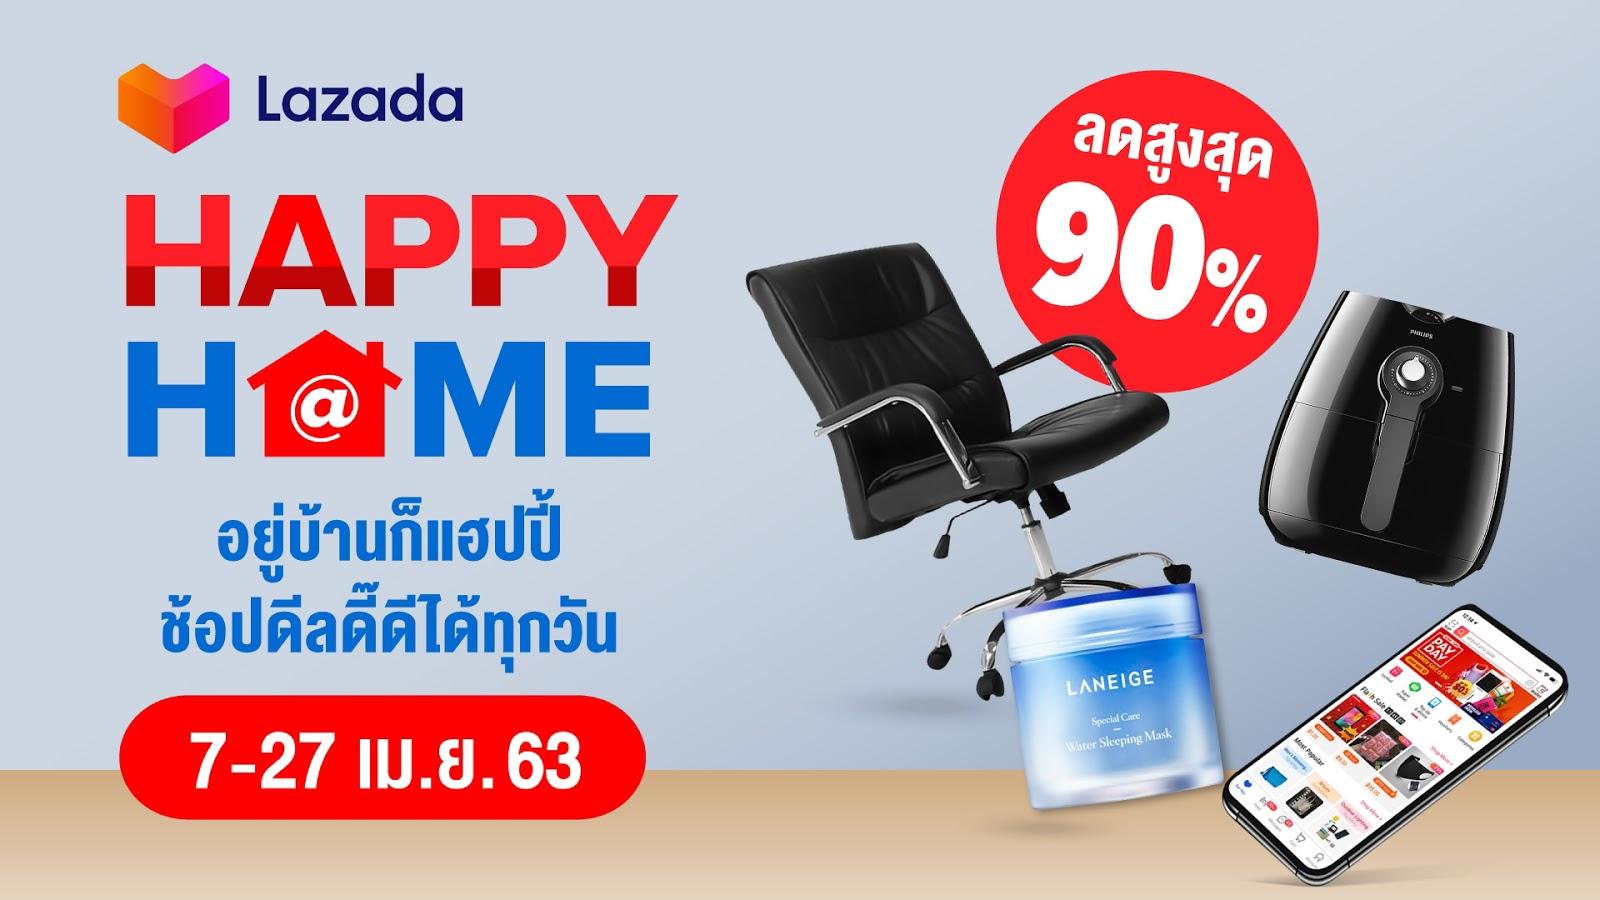 "Lazada ตอบรับมาตรการรัฐ ชวนคนไทยช้อปที่บ้านส่งแคมเปญ ""Happy at Home อยู่บ้านก็แฮปปี้ ช้อปดีลดี๊ดีได้ทุกวัน"" พร้อมส่งฟรีตลอดเมษายนเริ่ม  7 – 27 เมษายนนี้"